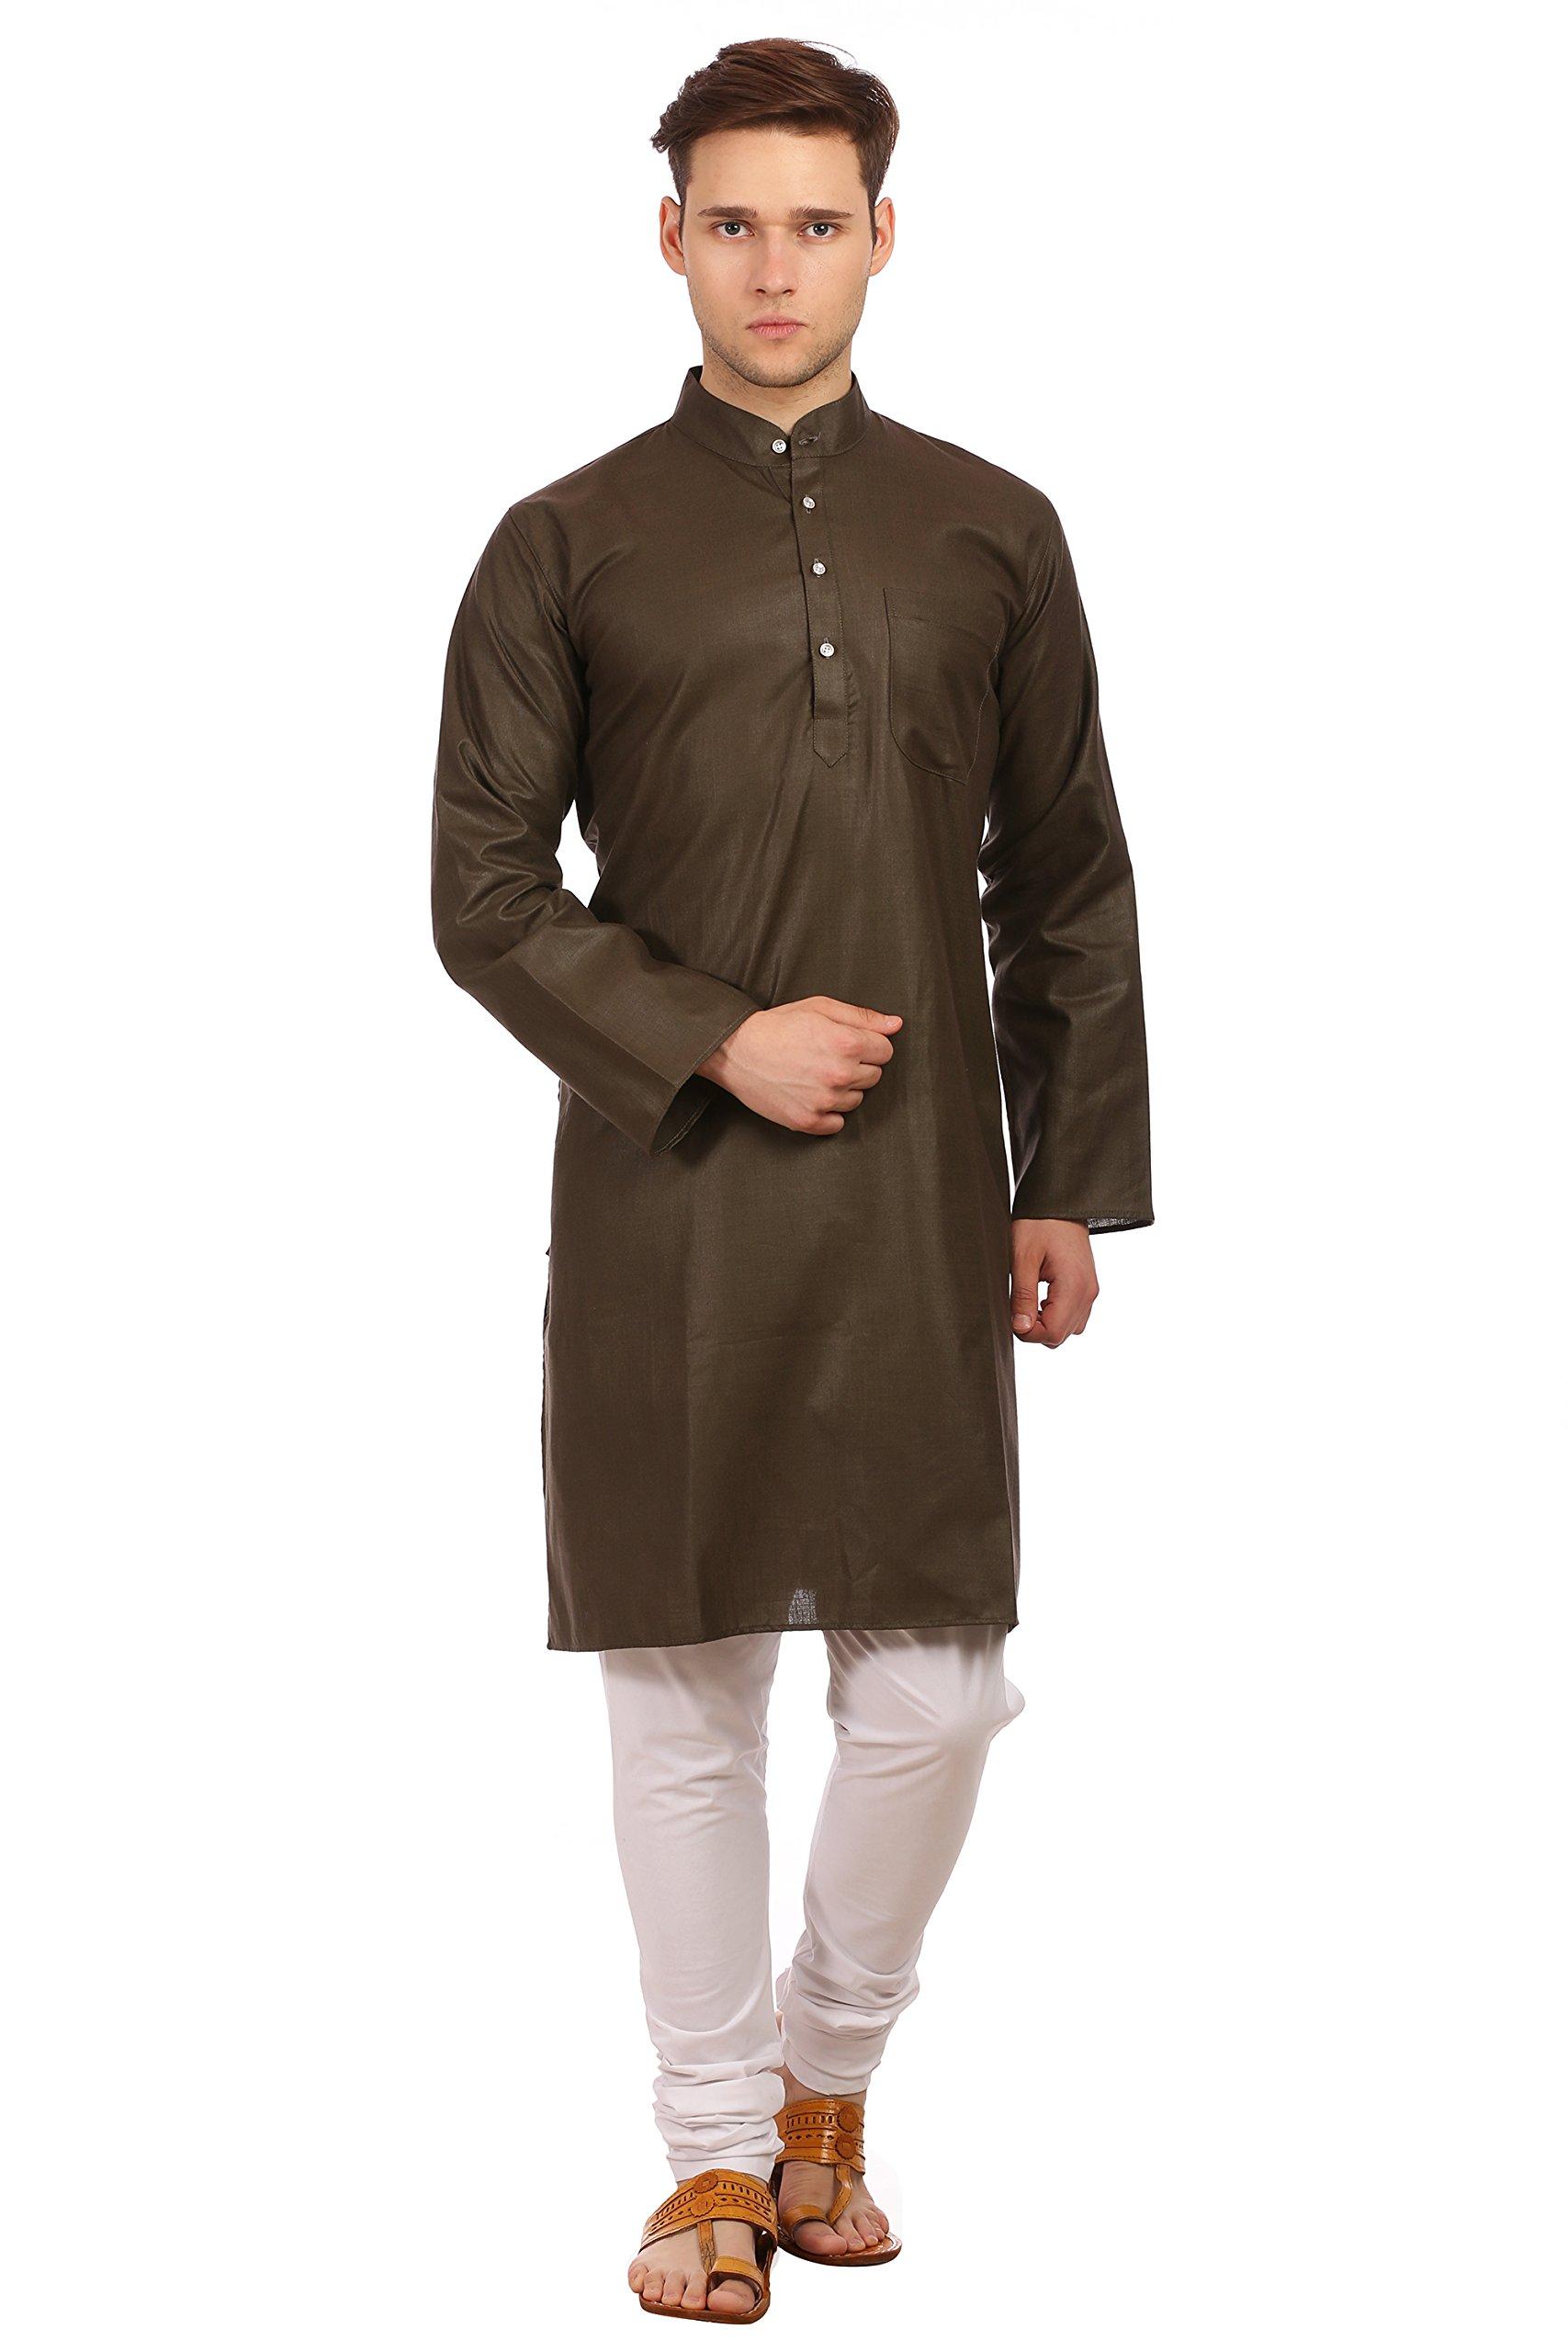 WINTAGE Men's Cotton Silk Festive and Casual Olive Kurta Pyjama